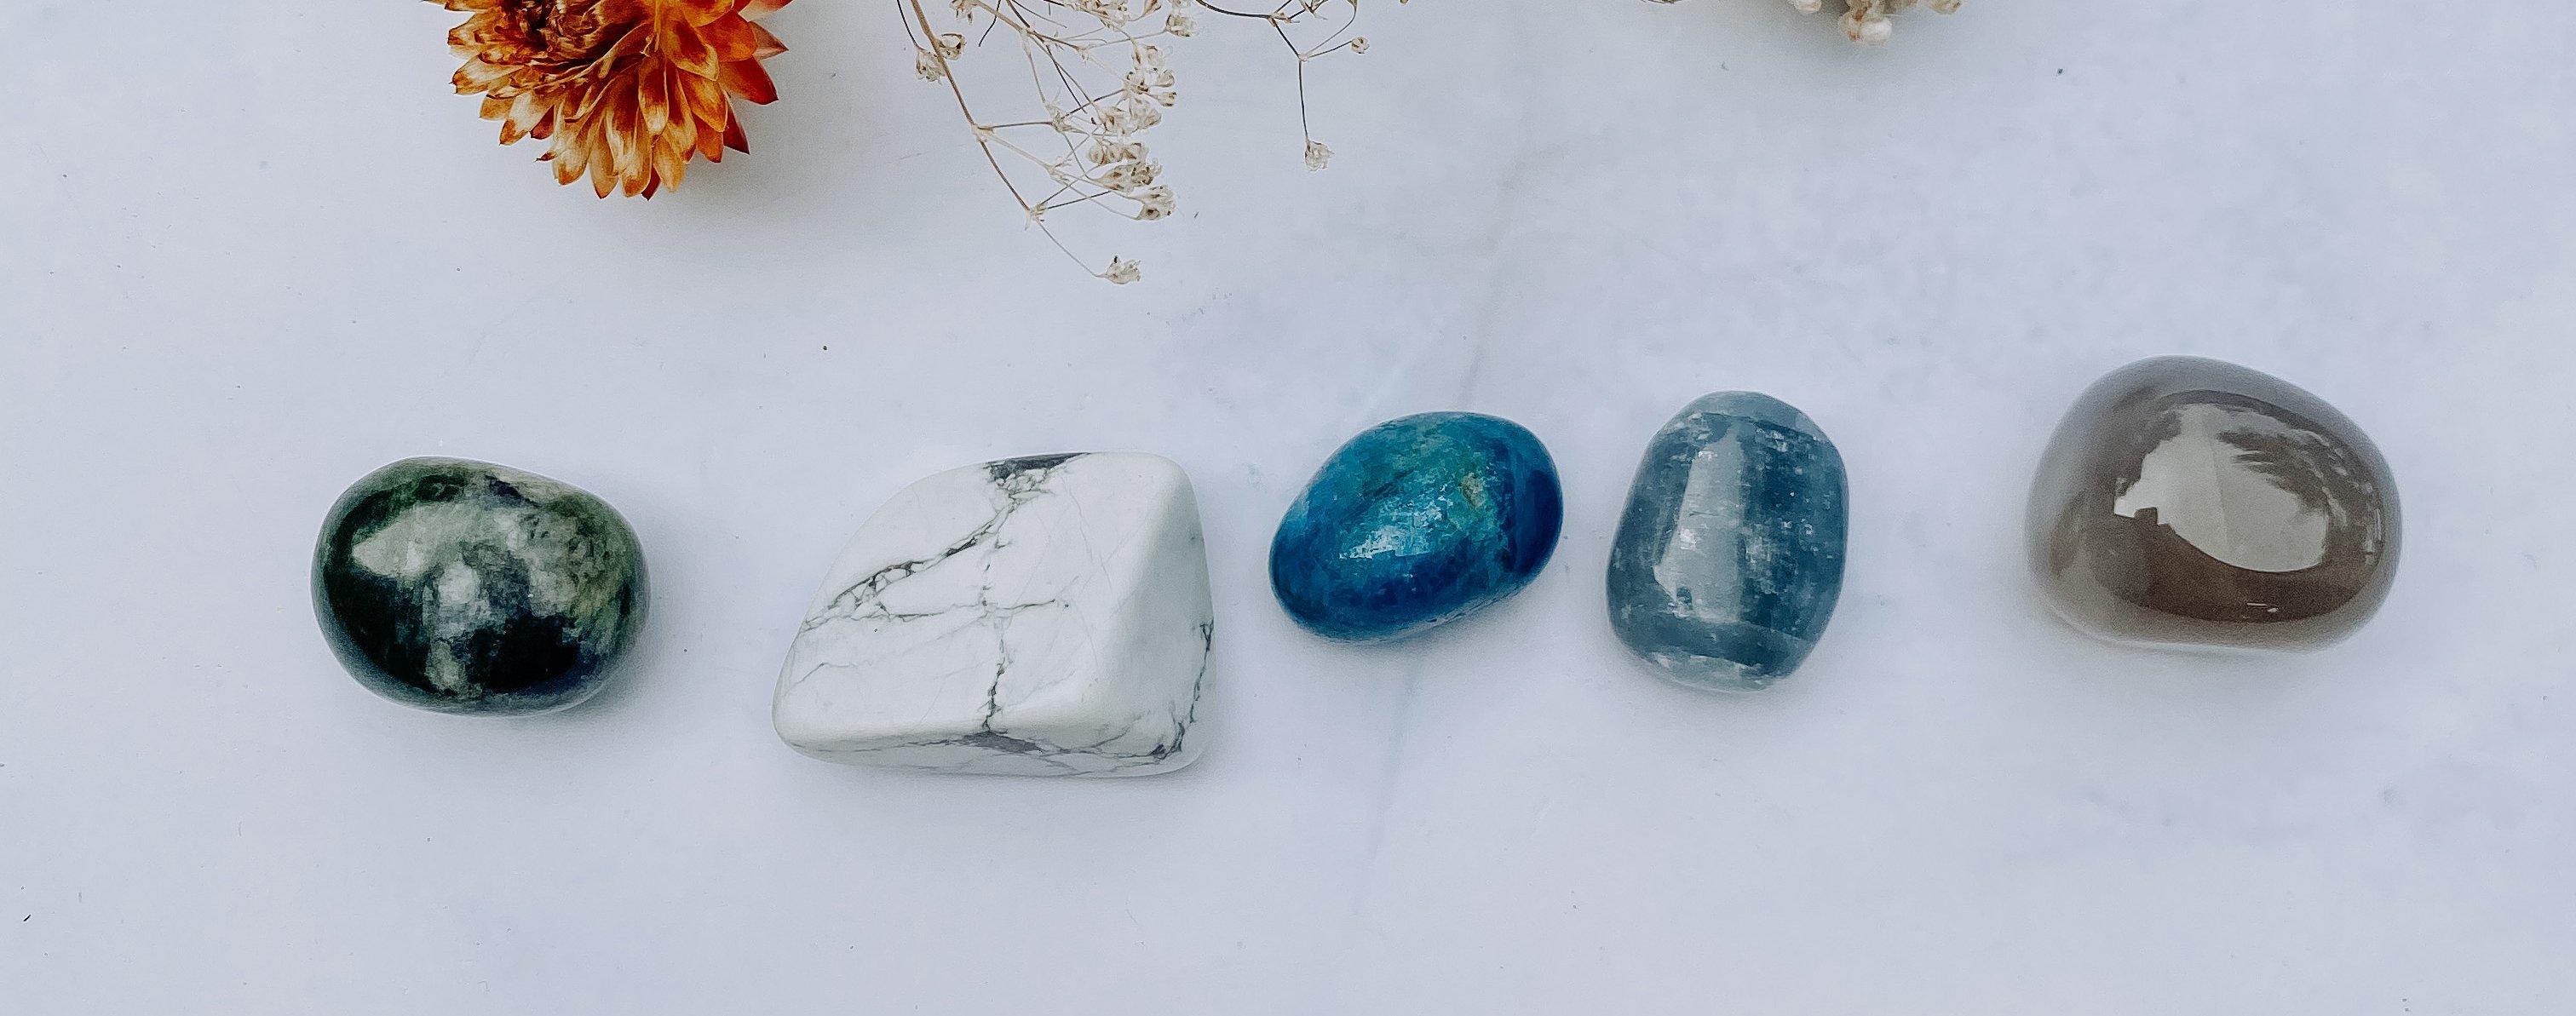 Crystals for Gemini Season